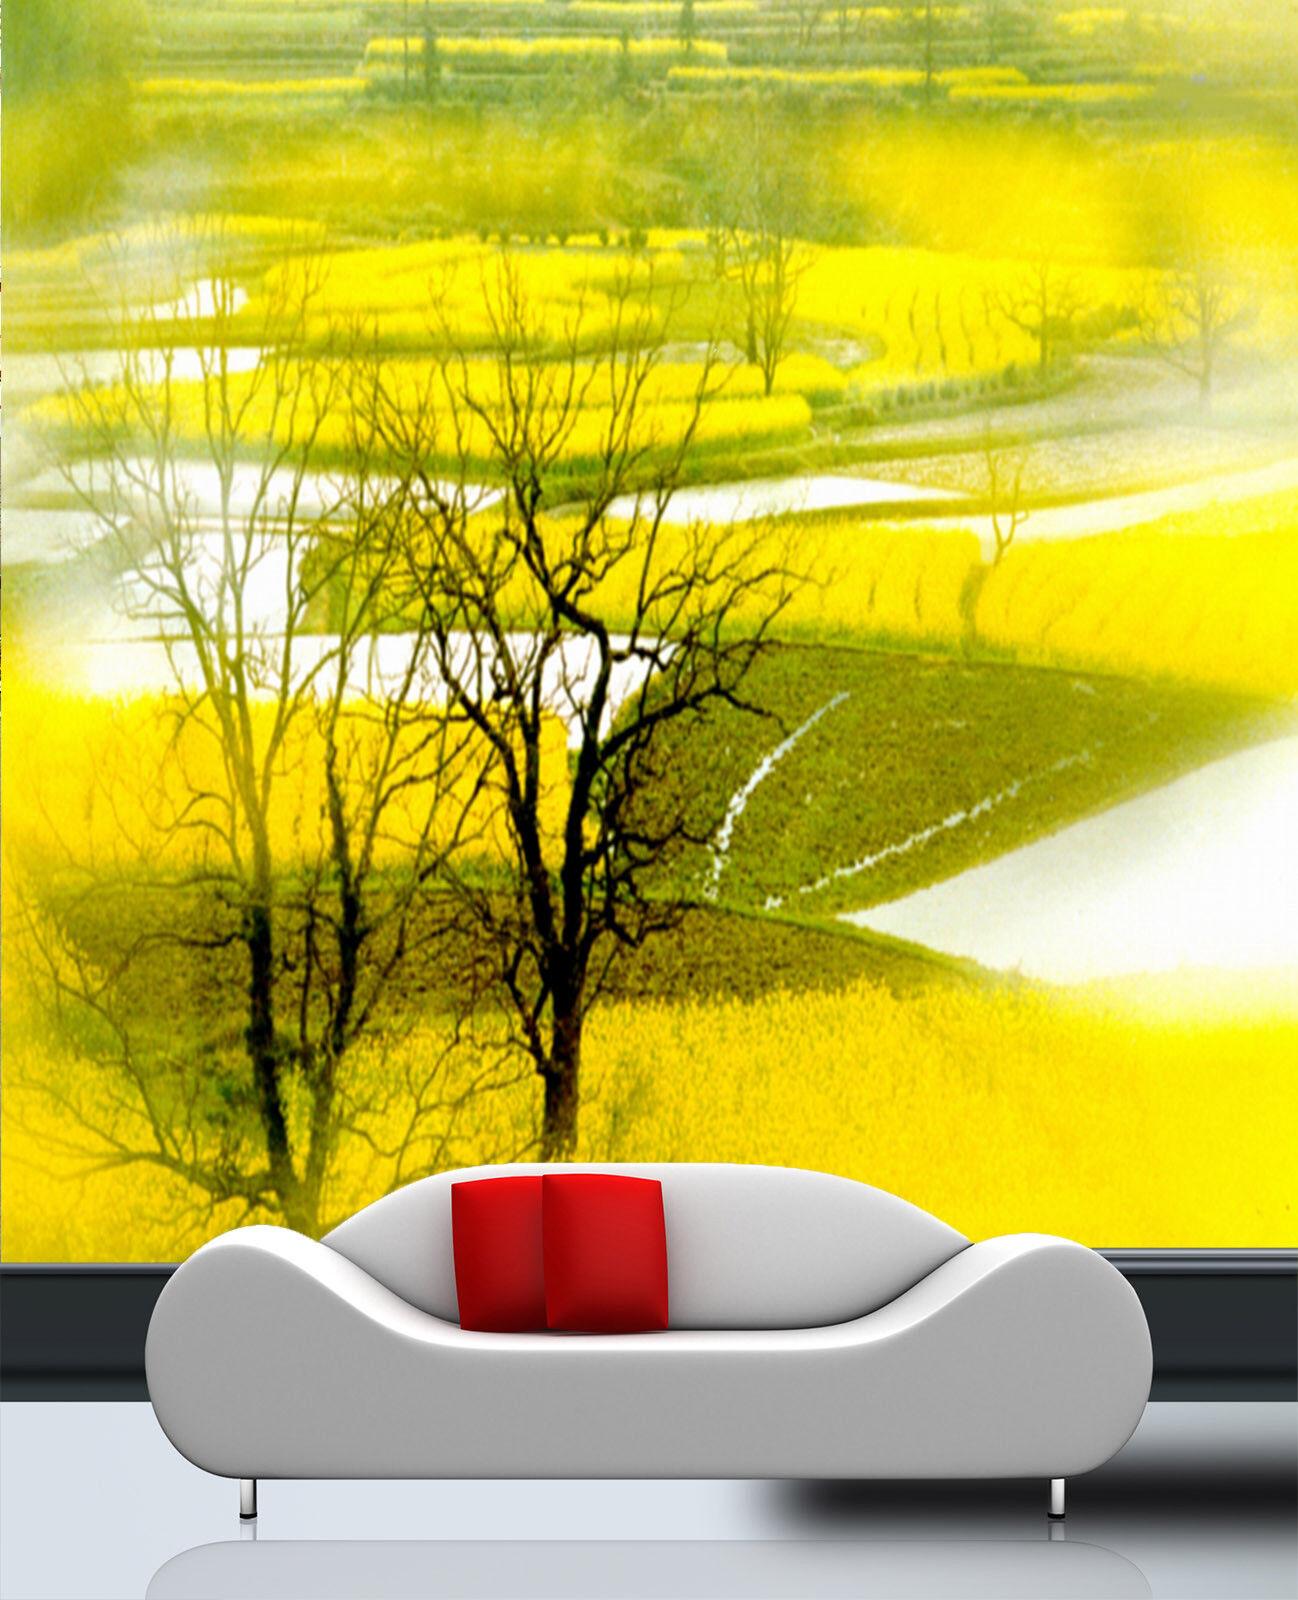 3D Cartoon Tree 607 Wallpaper Murals Wall Print Wallpaper Mural AJ WALL UK Lemon